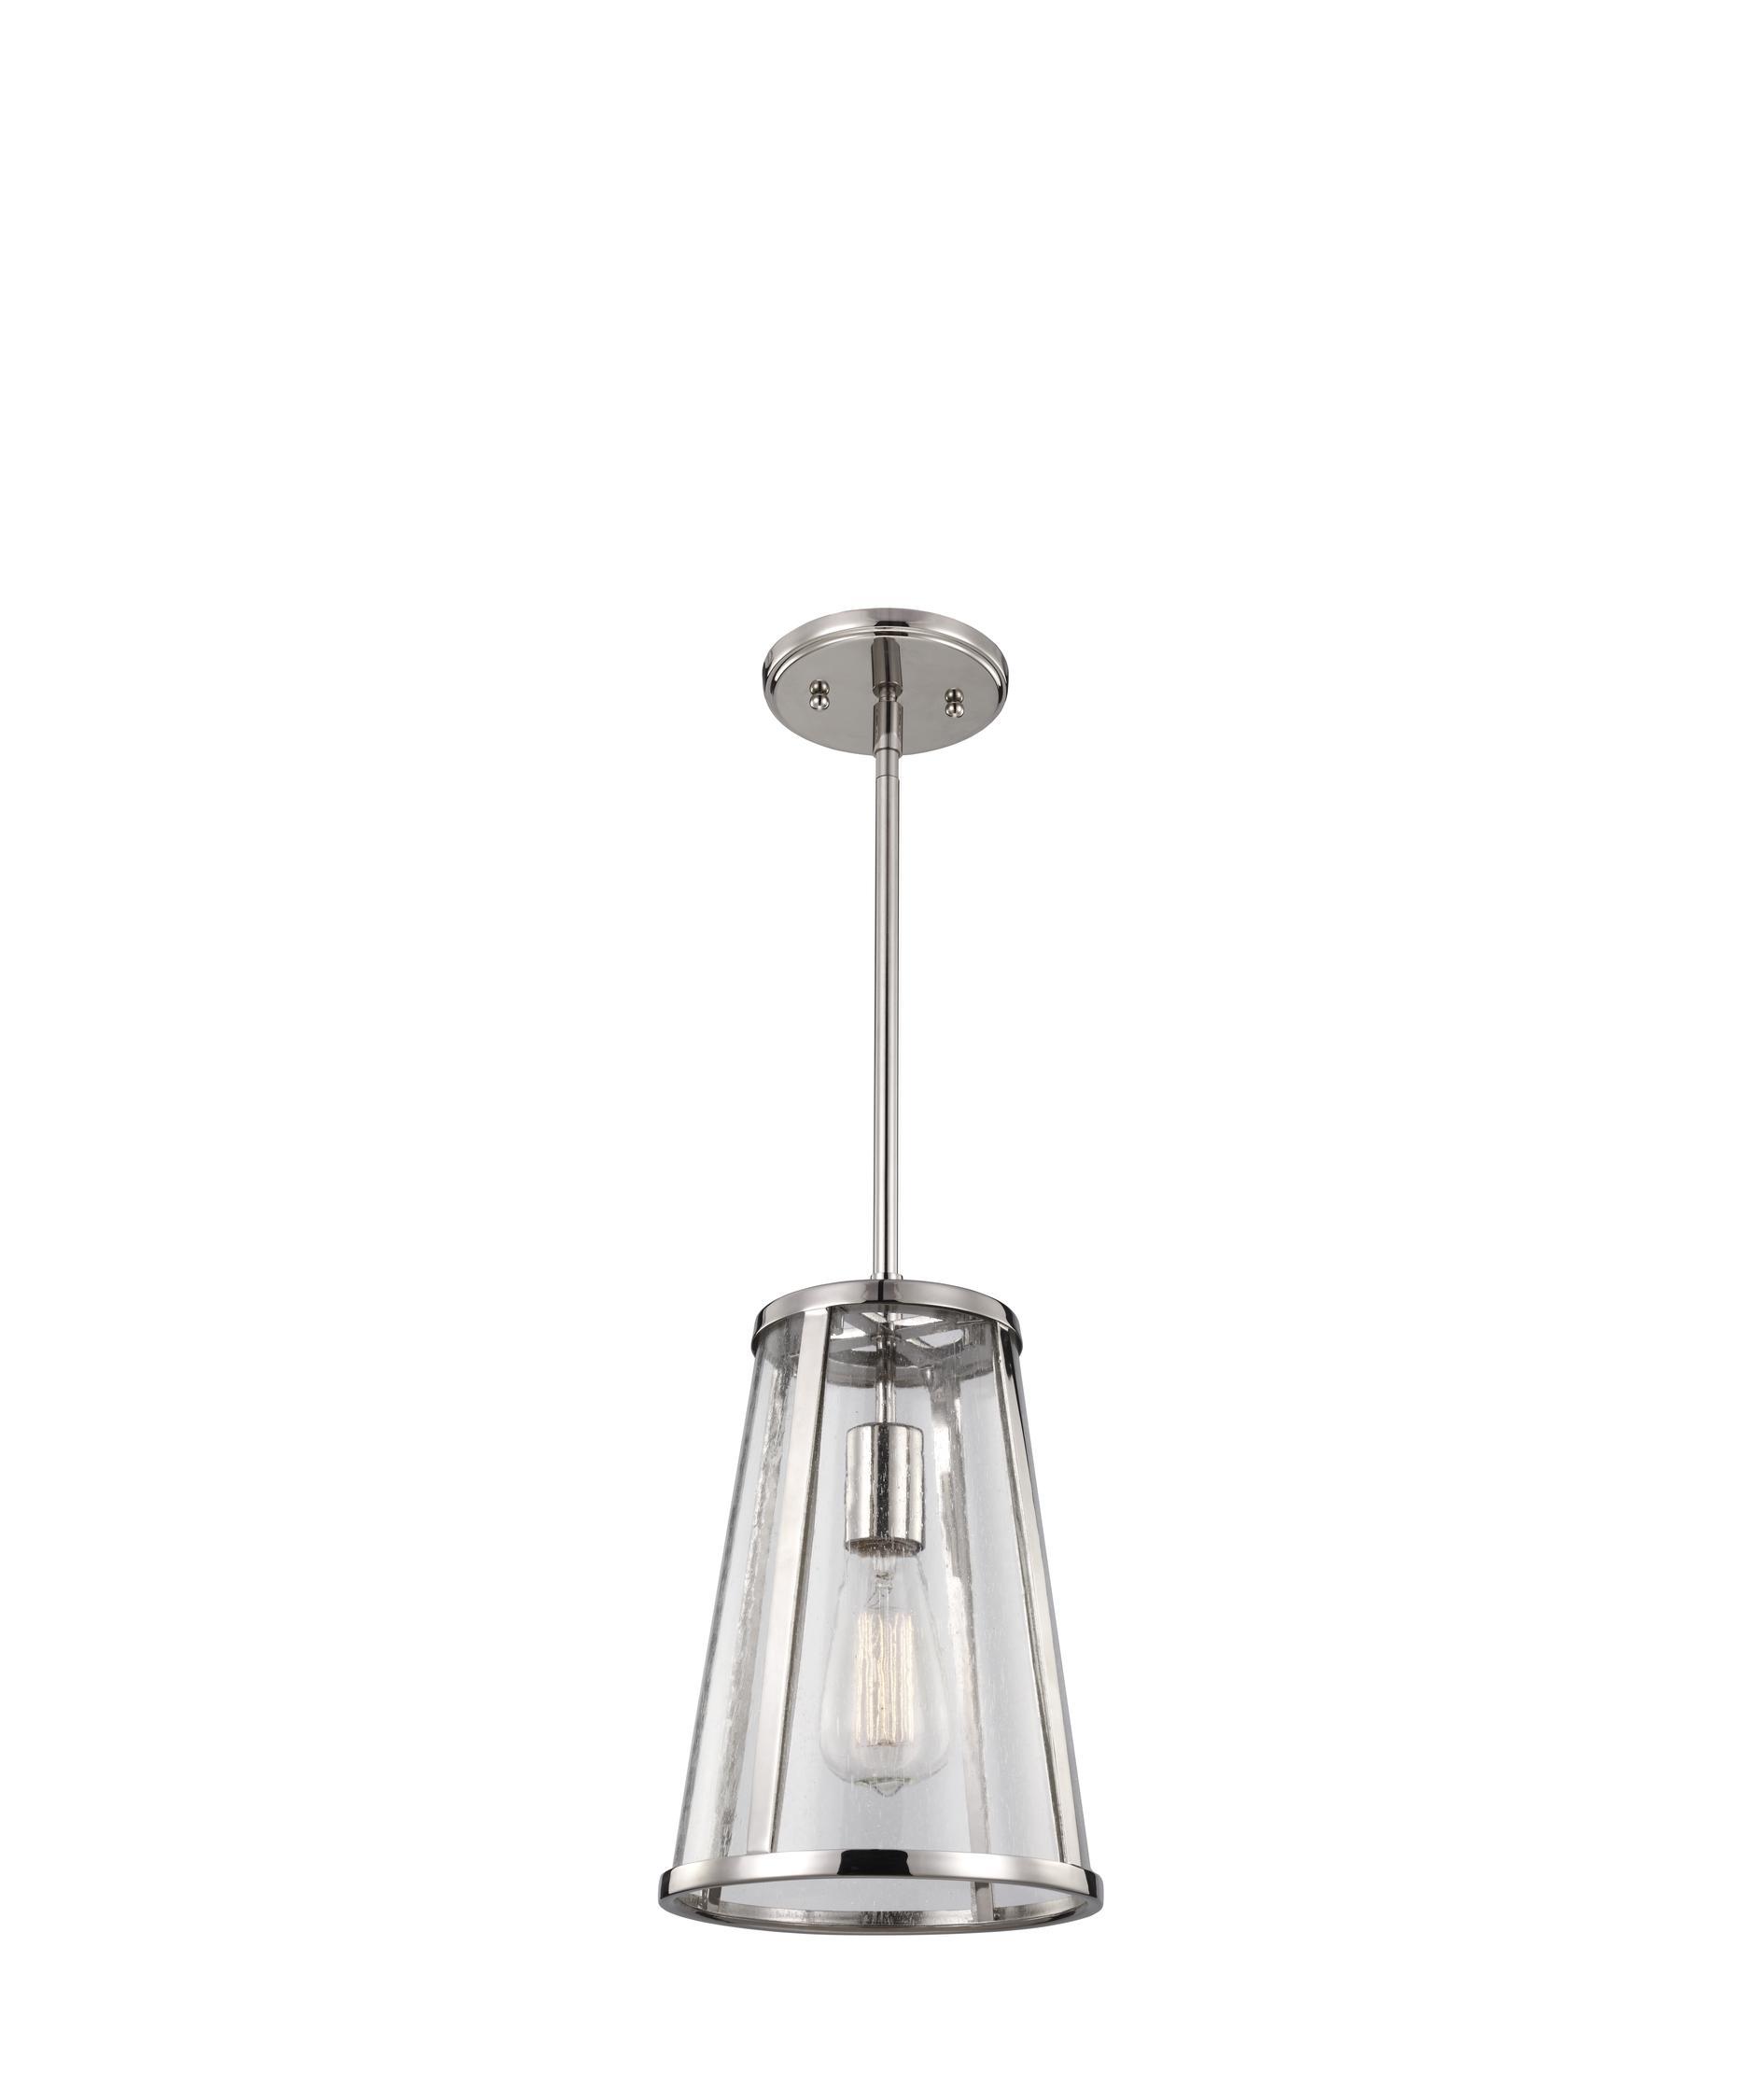 murray feiss p1287 harrow 8 inch wide 1 light mini pendant capitol lighting - Feiss Lighting